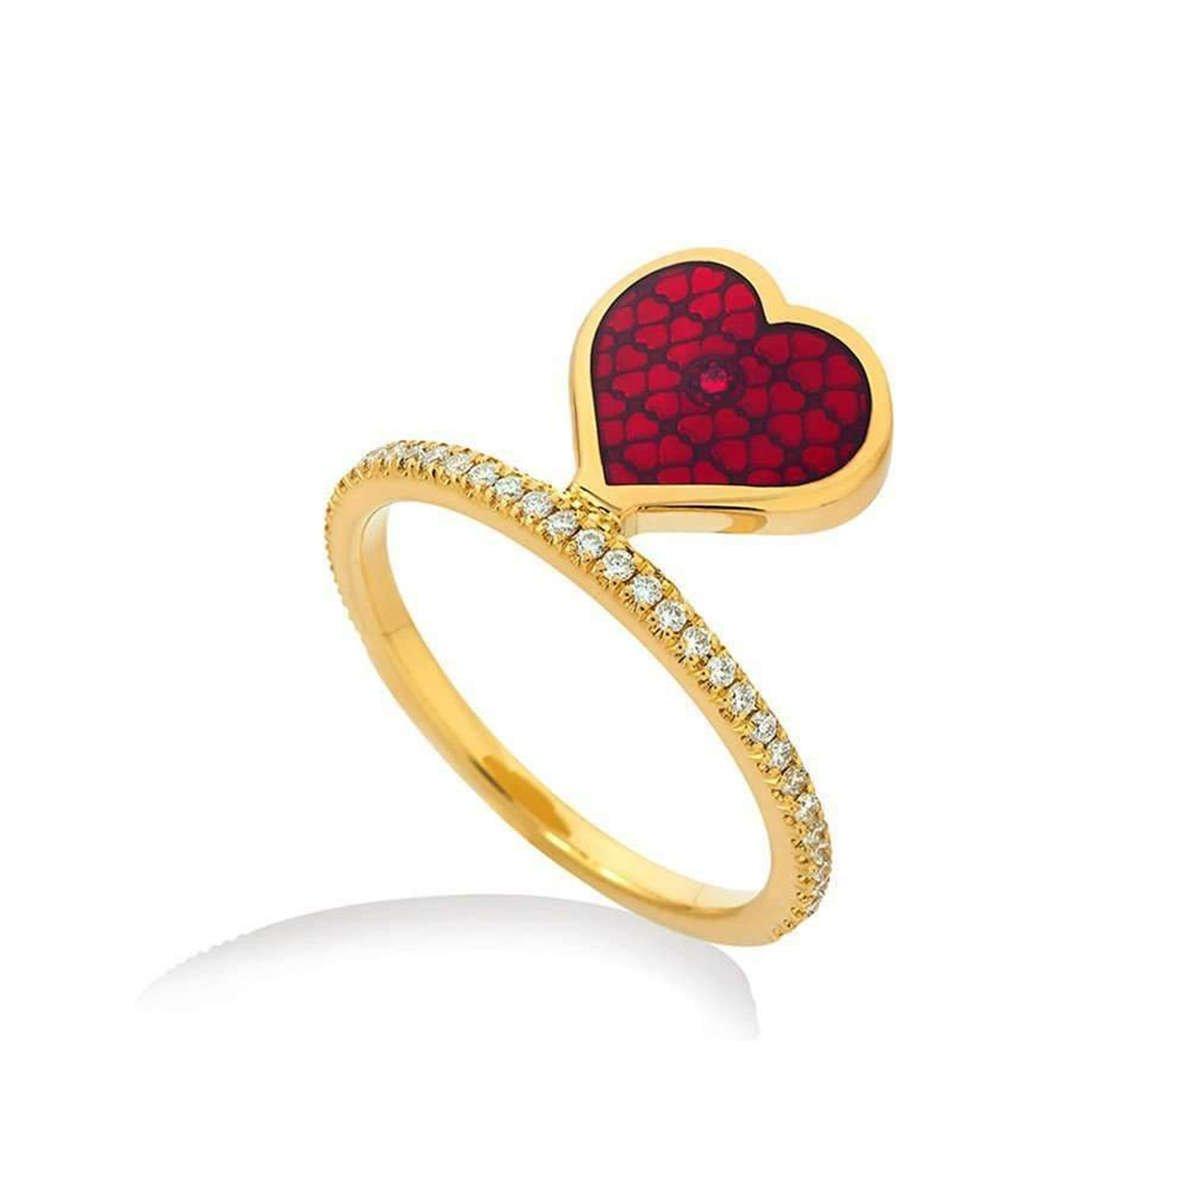 Red Casino Heart Ring - Raliegh Goss